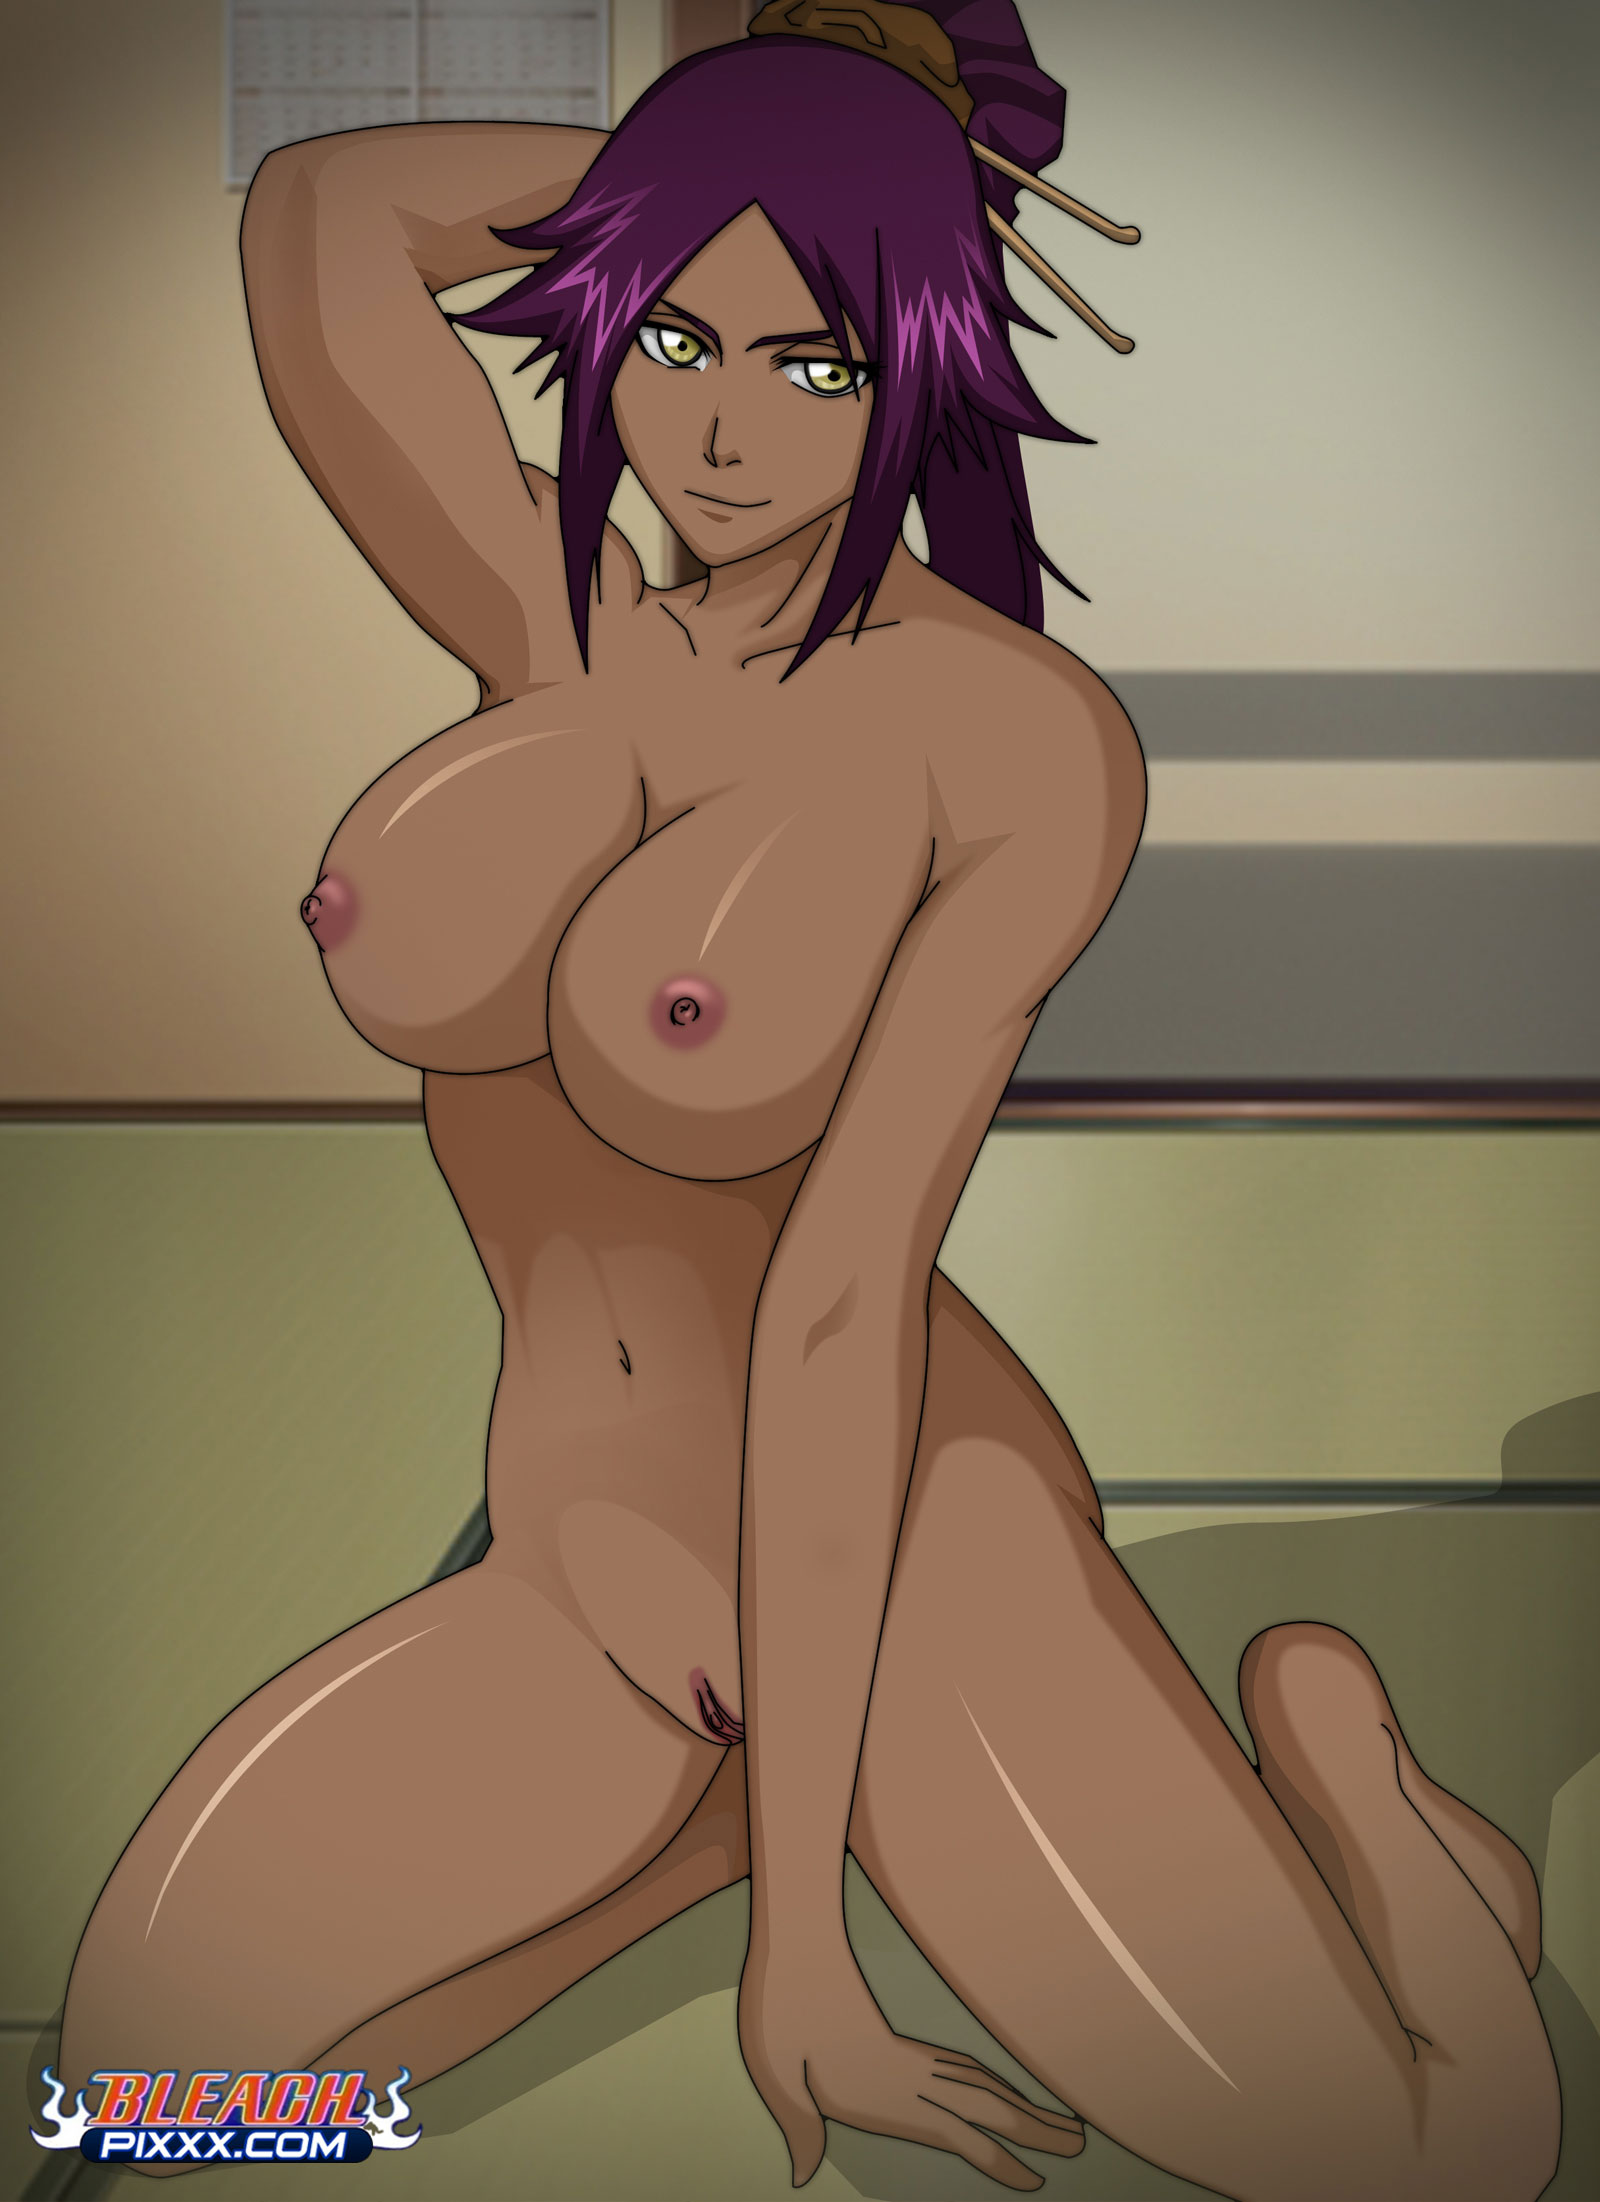 Bleach Girls Xxx - Image 4 Fap-9861